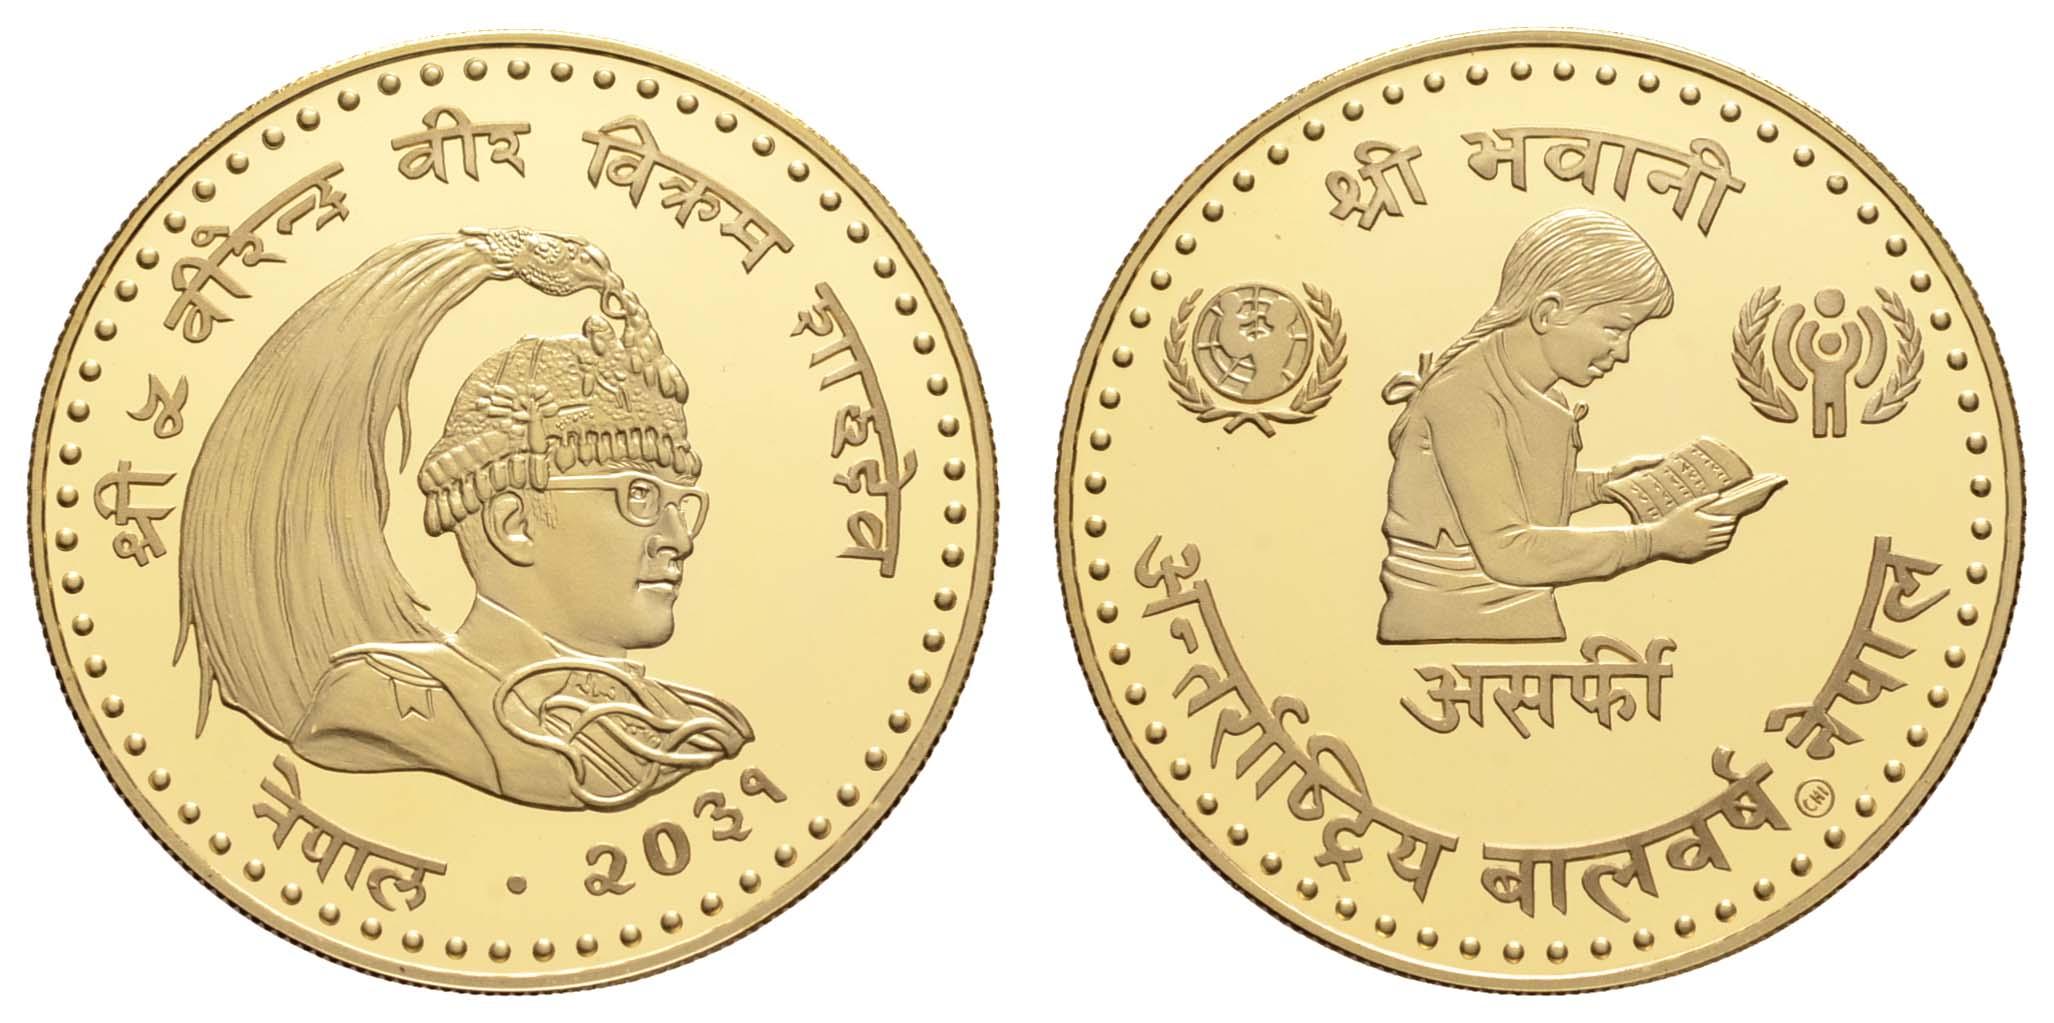 Lot 2075 - übersee Nepal -  Auktionshaus Ulrich Felzmann GmbH & Co. KG Coins single lots